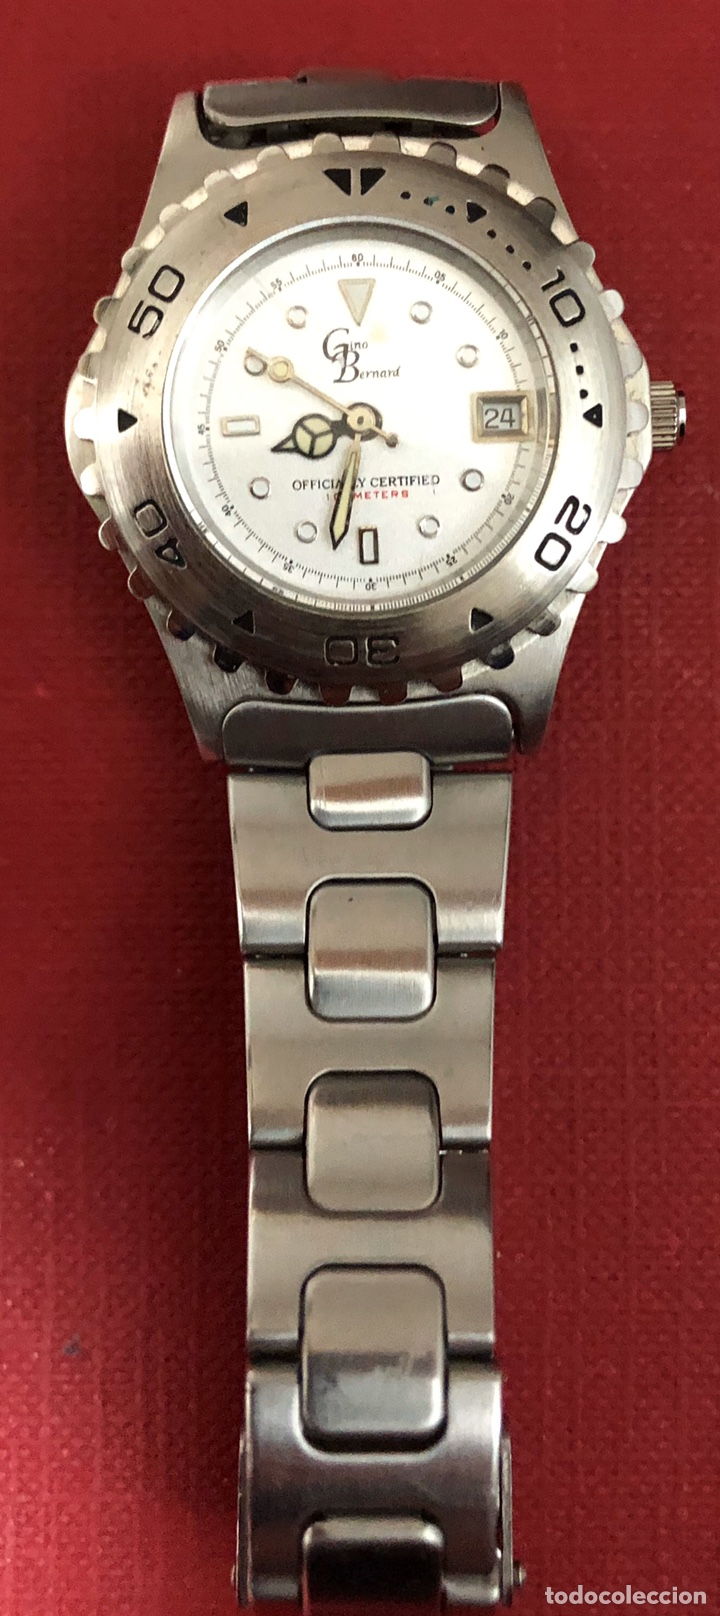 Relojes: Bonito reloj de señora, de cuarzo Gino Bernard. - Foto 4 - 191927088